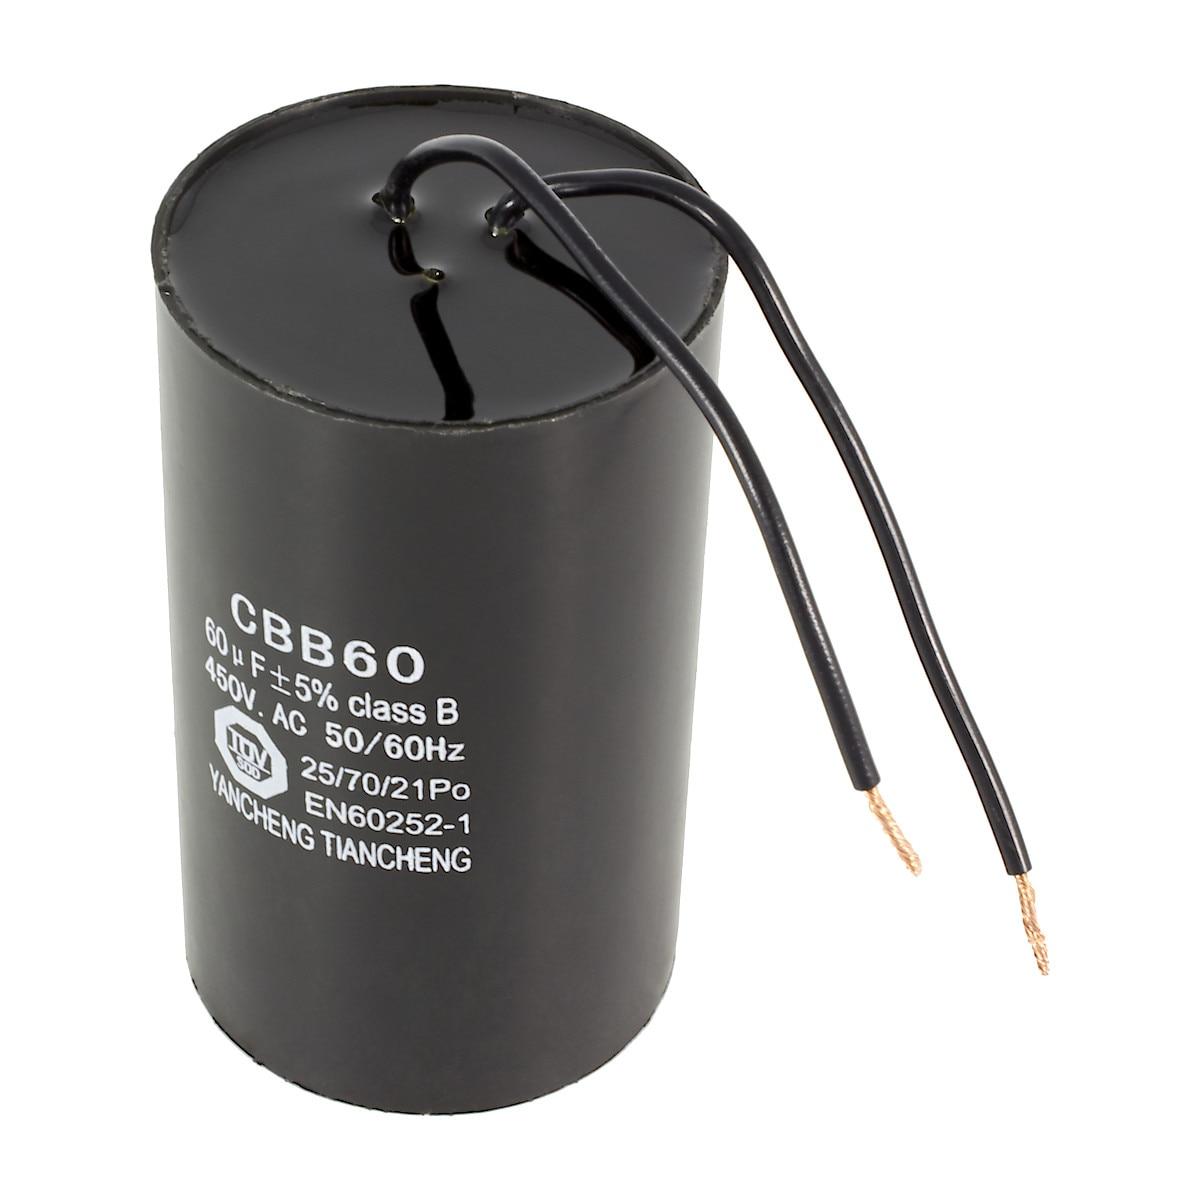 Kondensator 60 µF CBB60 Cotech